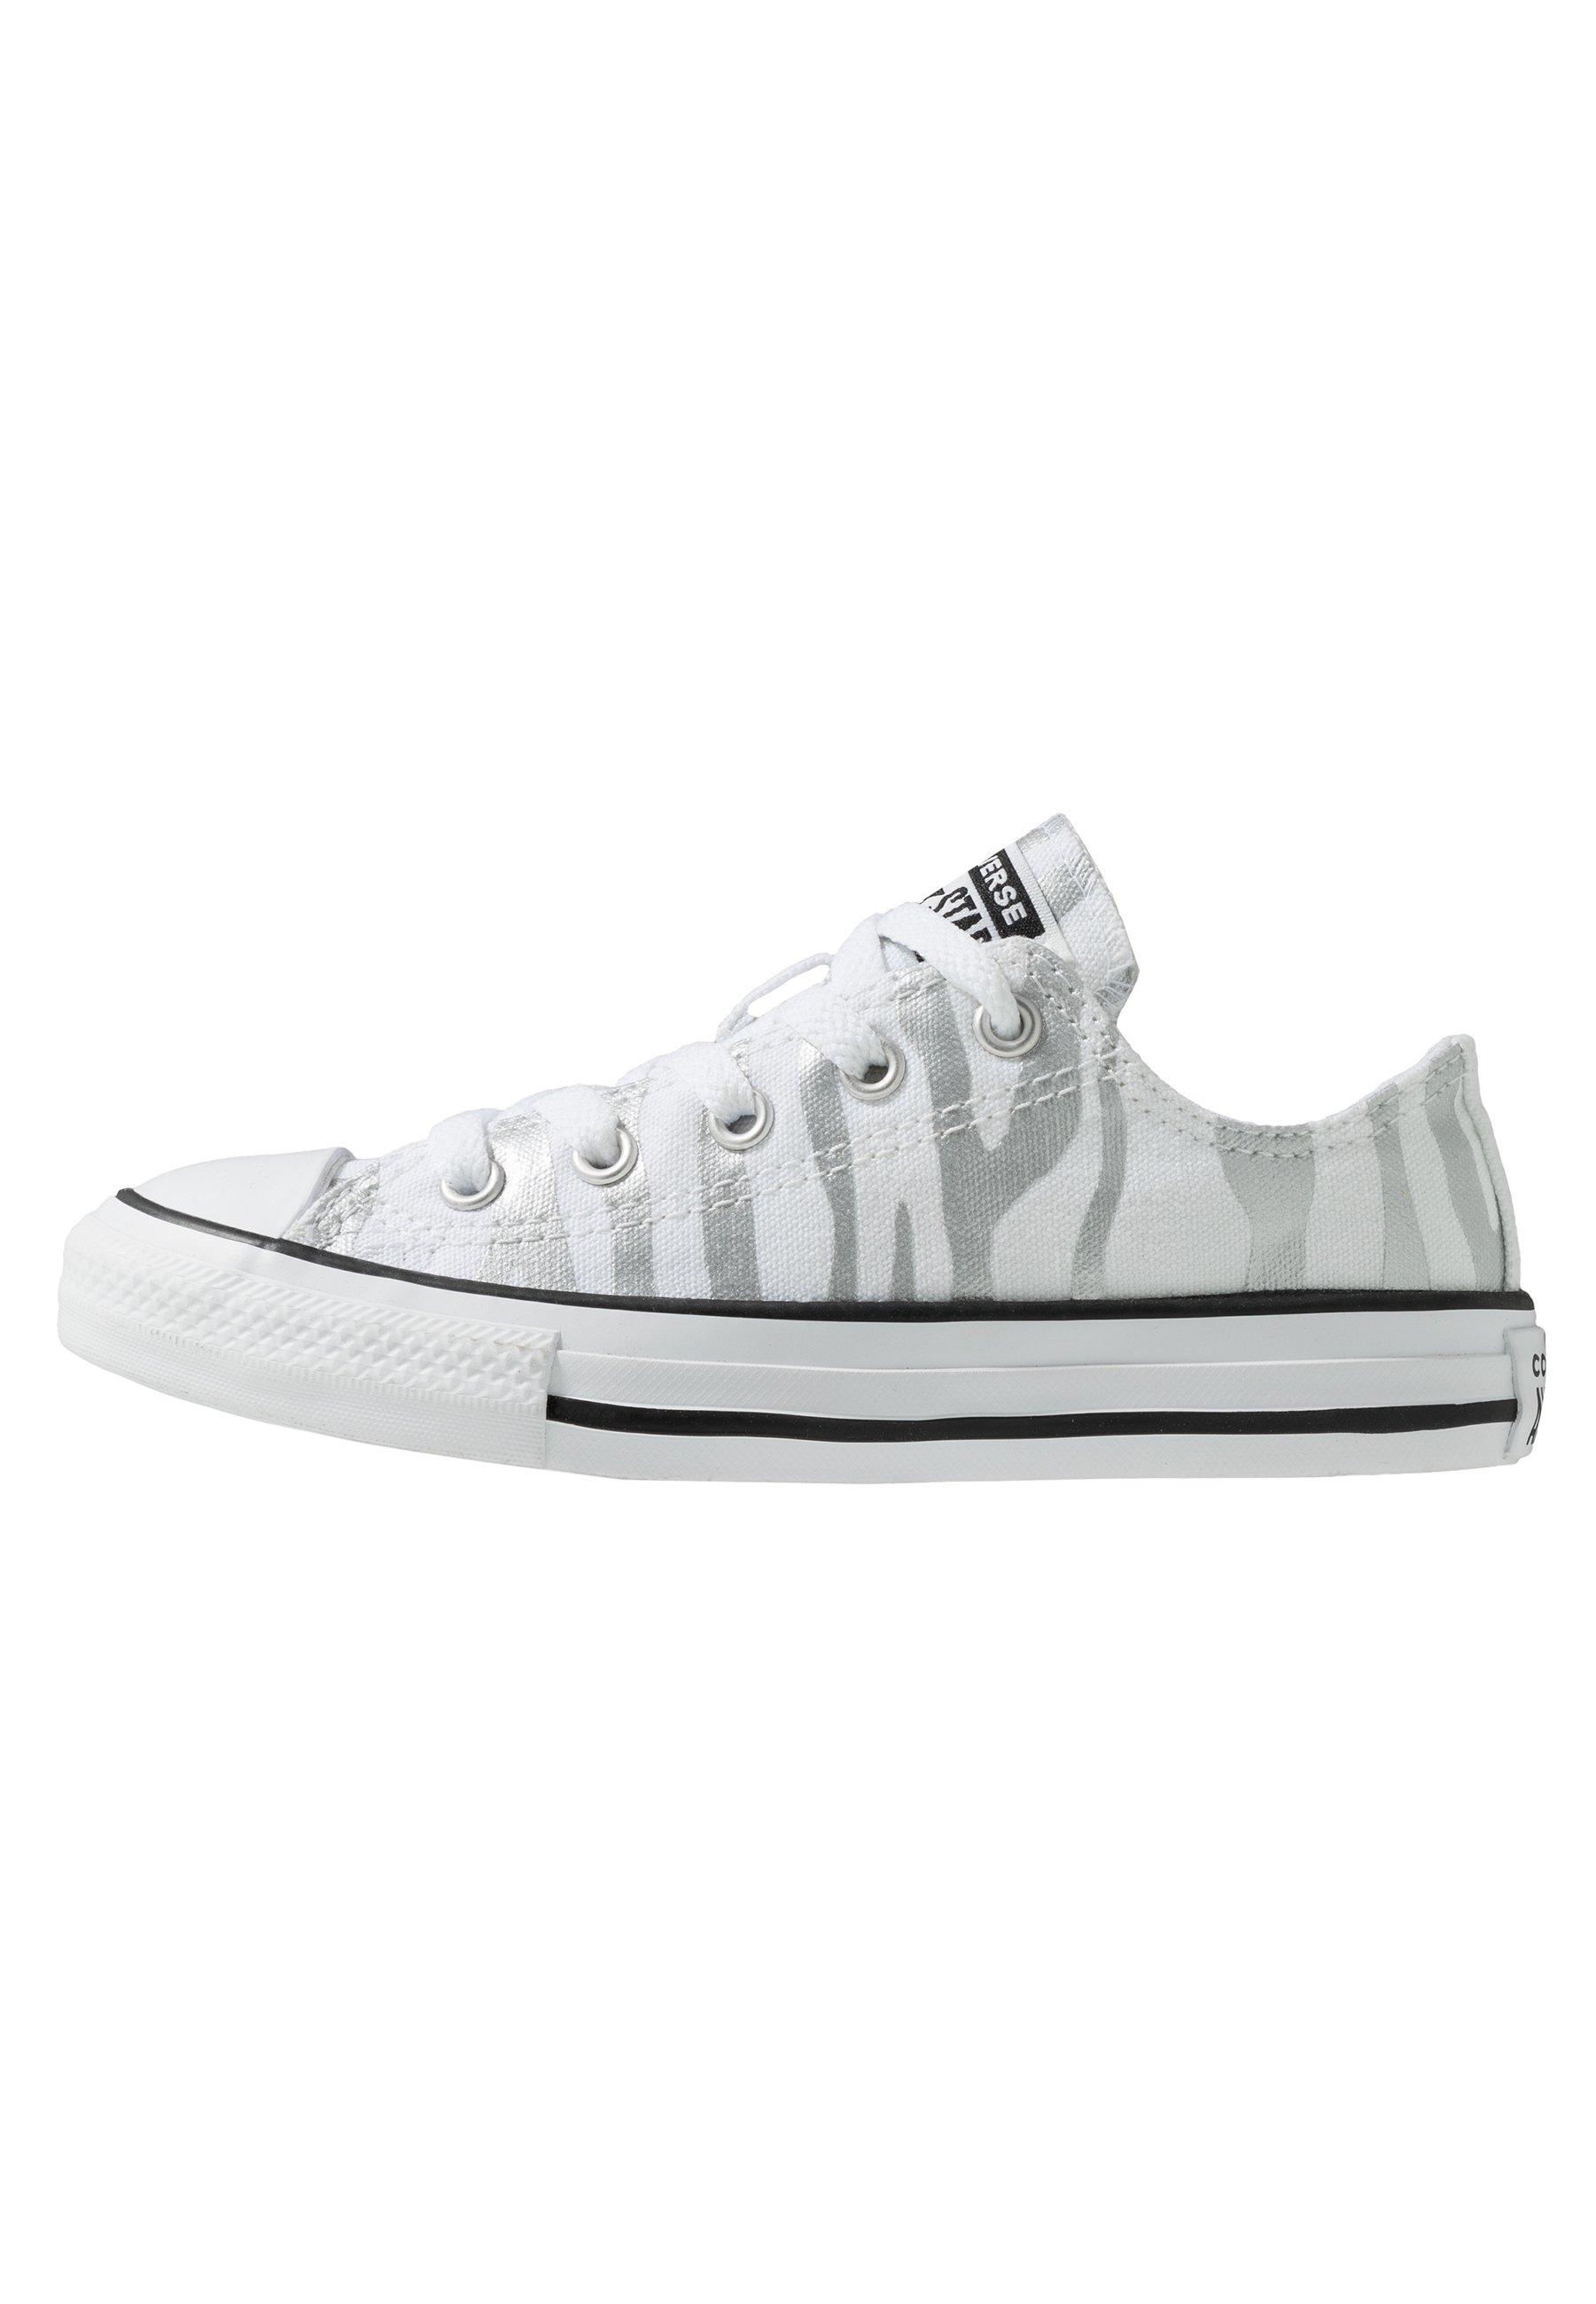 CHUCK TAYLOR ALL STAR Sneakers laag whiteblack